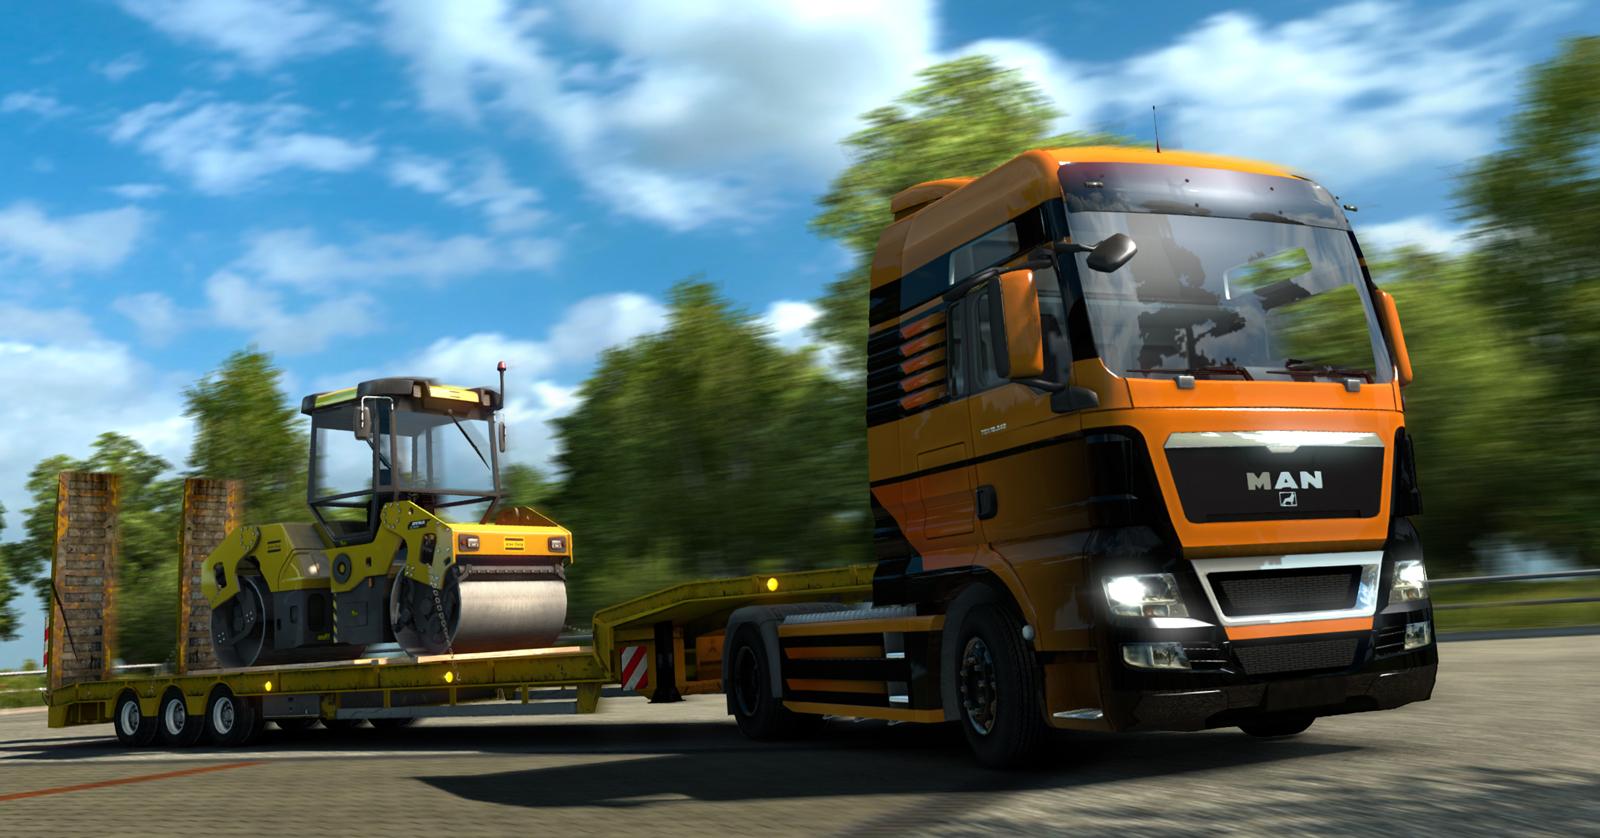 Euro truck simulator 2 mods daf xf 105 james s hislop pictures to pin - News Zum Euro Truck Simulator 2 News Vom Scs Software German Modification Team